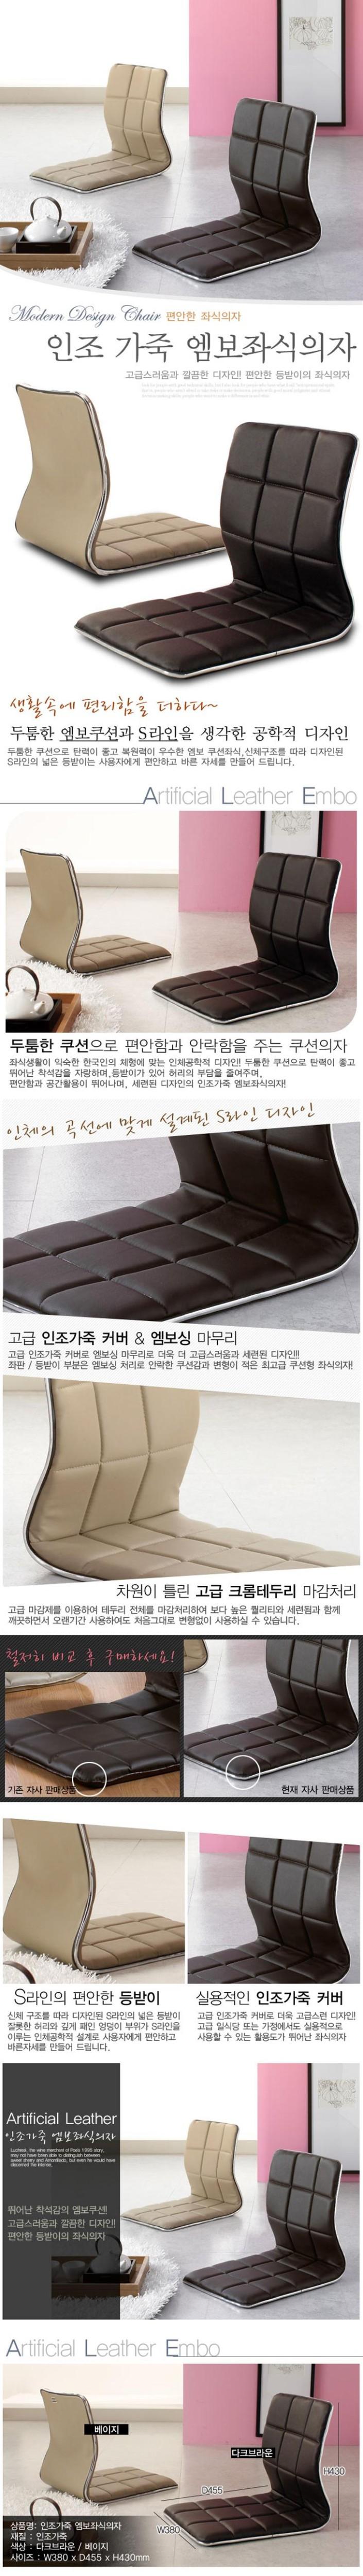 floor chair-1